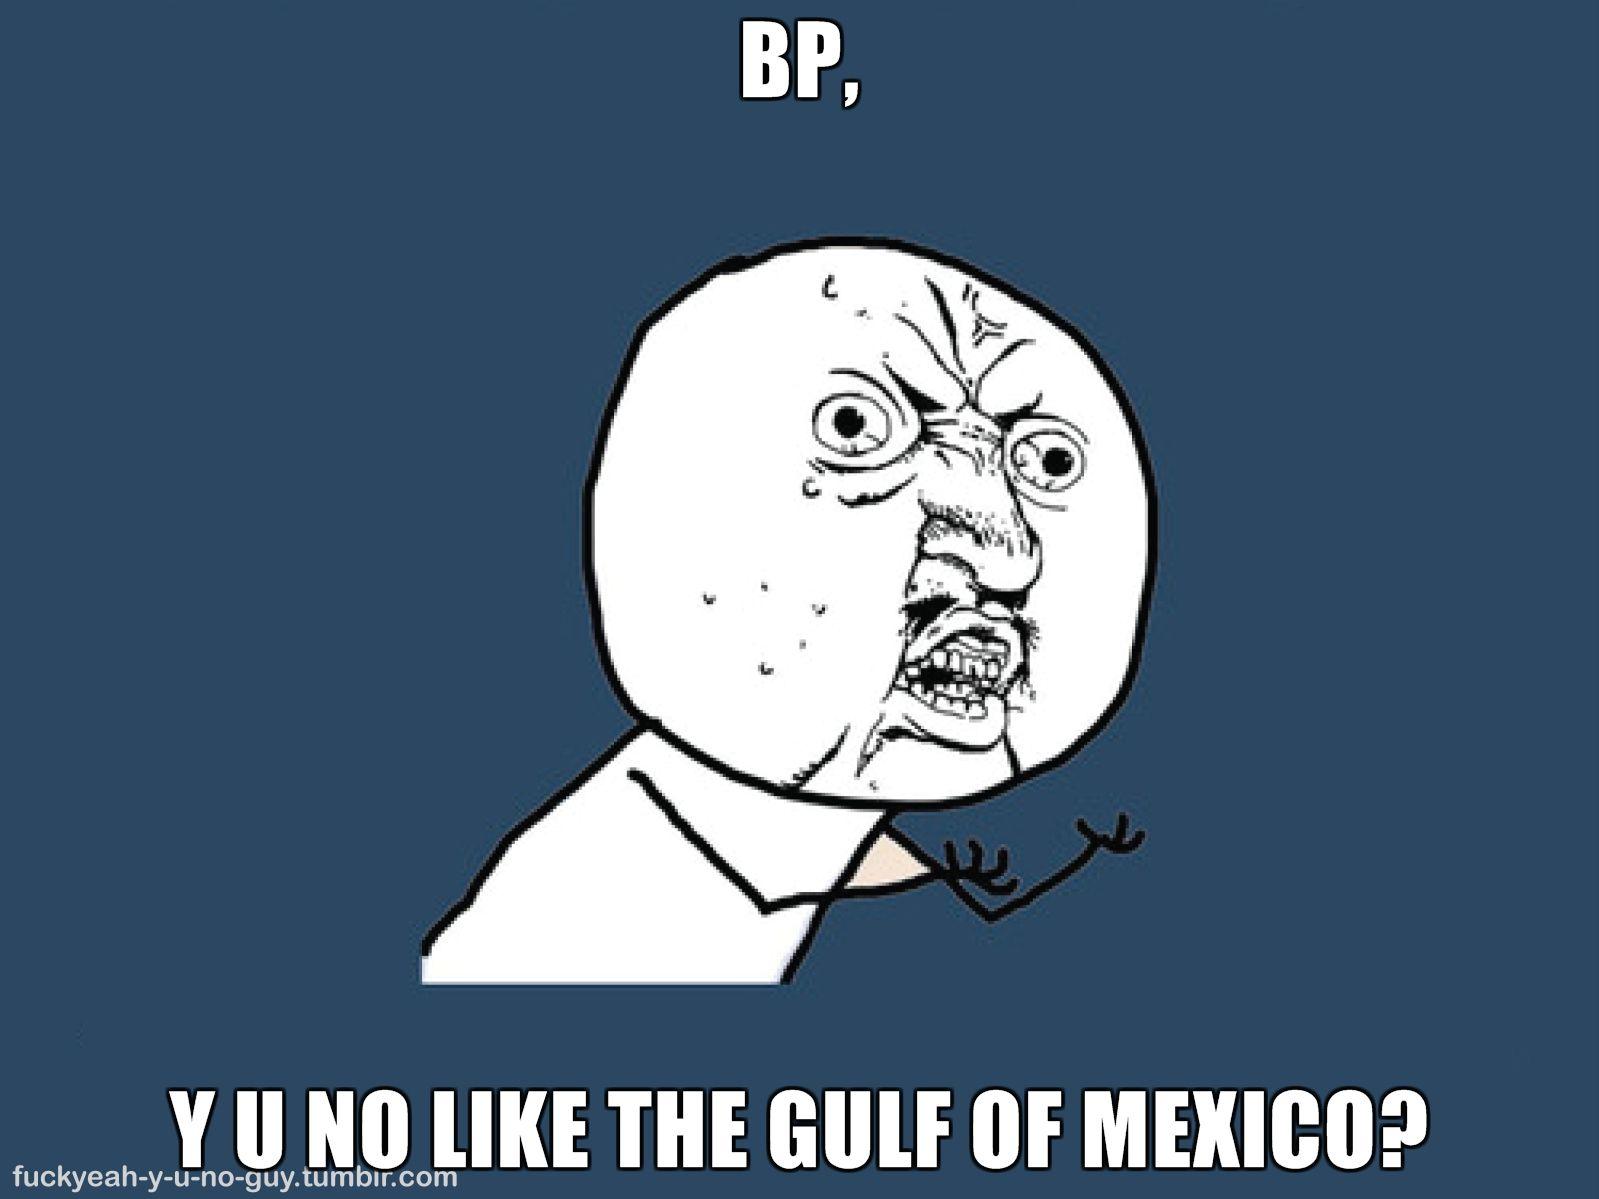 BP Y U NO LIKE THE GULF OF MEXICO image 74592] \